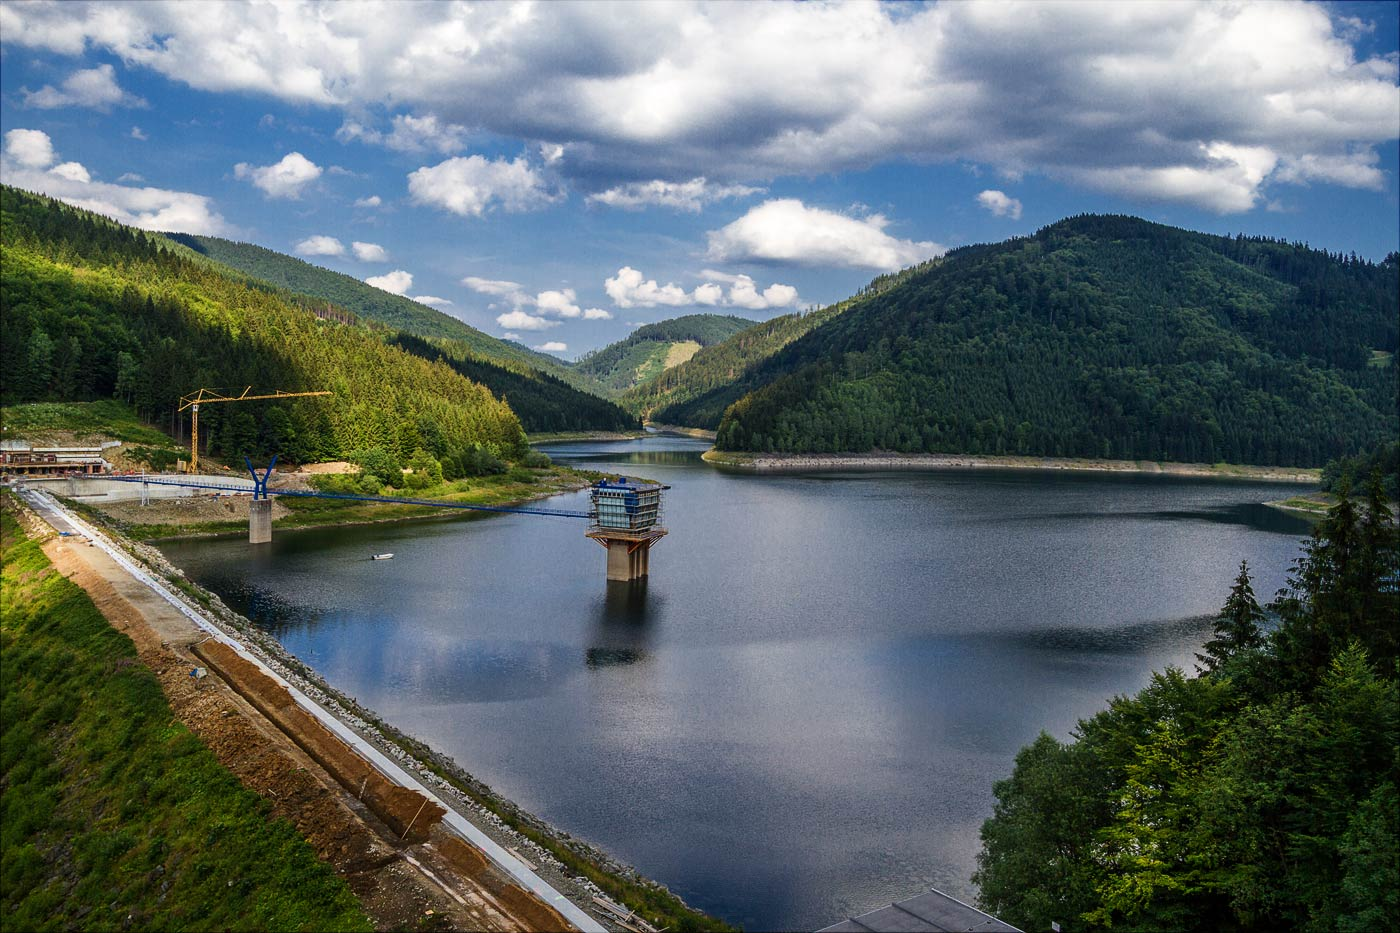 Водохранилище Шанце в Моравии